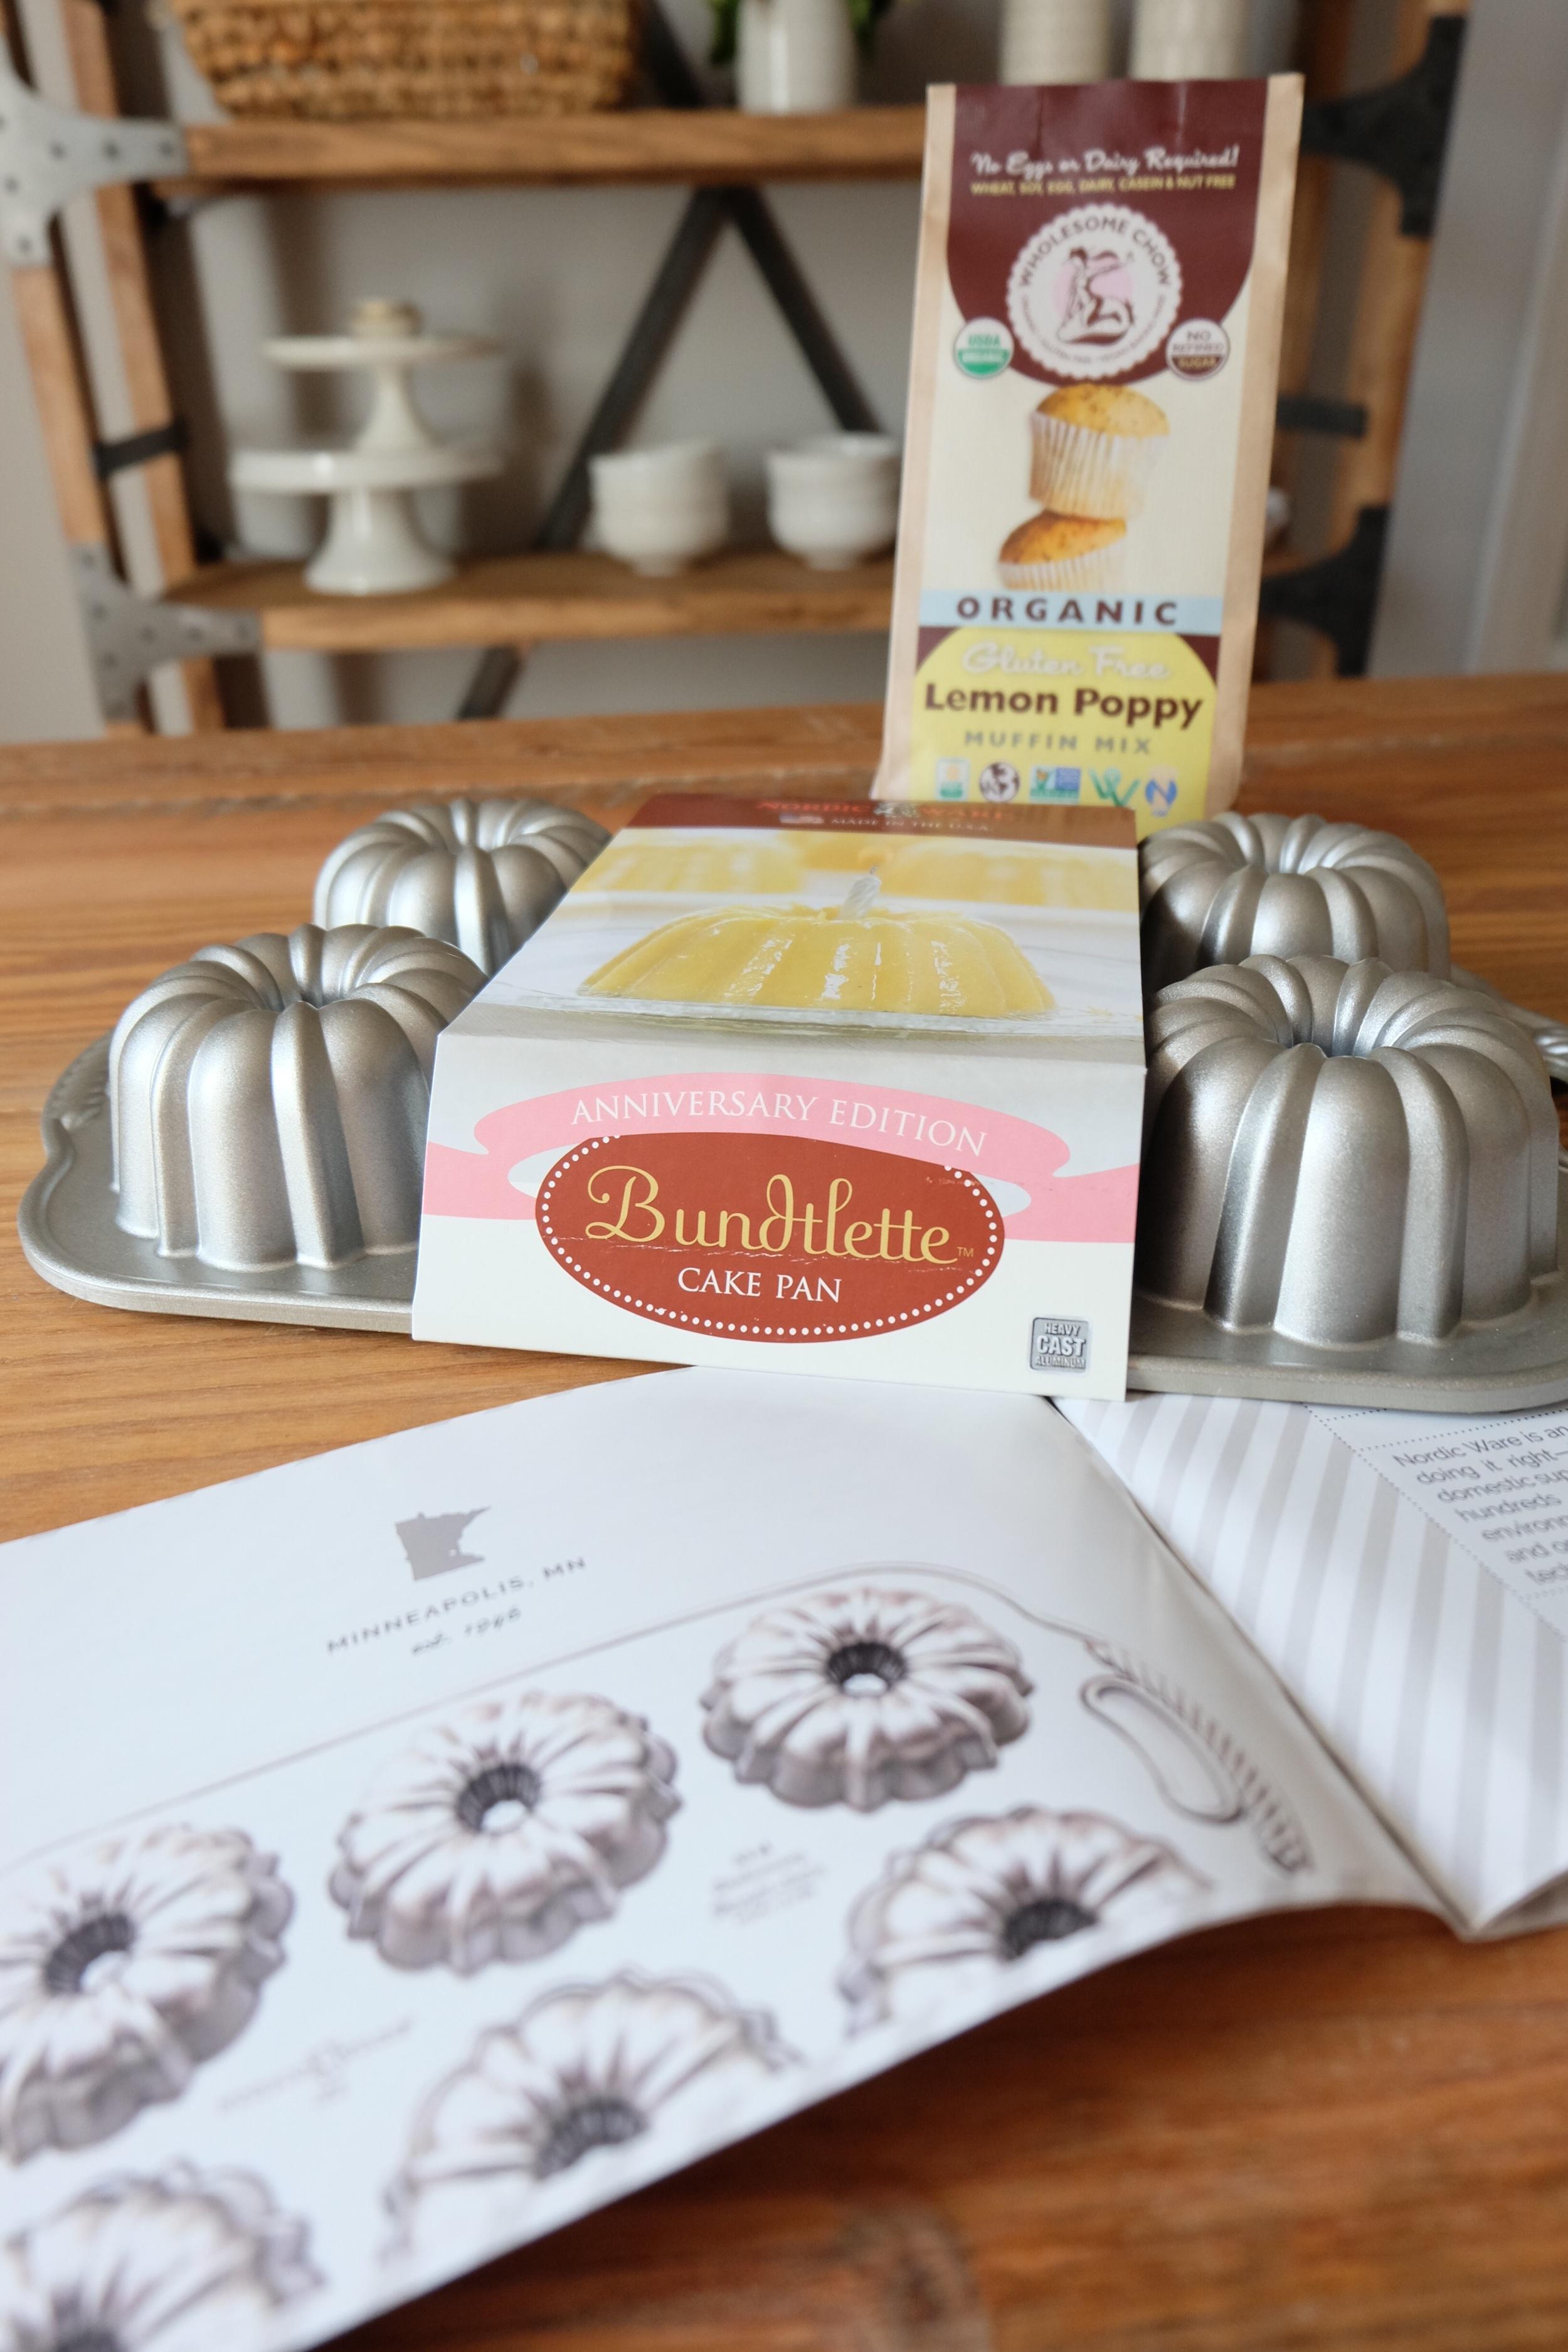 This Bundt cake pan & lemon poppy muffin mix!